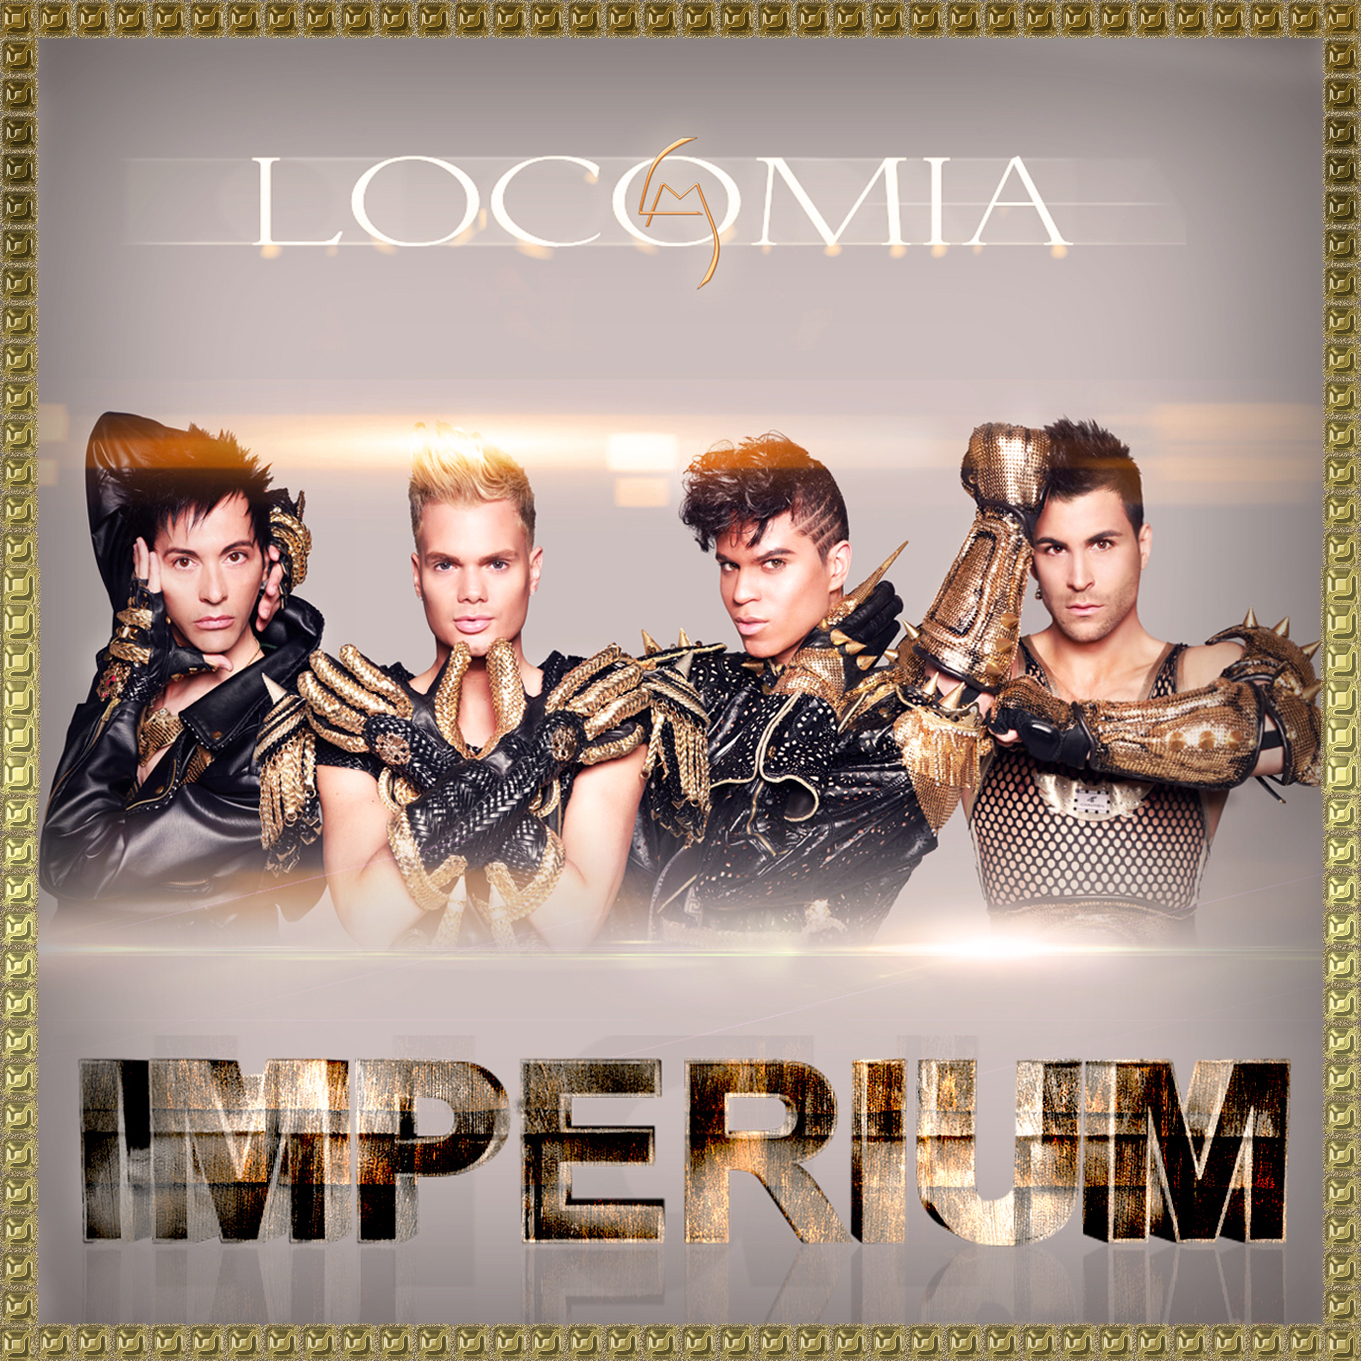 Imperium  (Escucha a Locomia en Spotify)